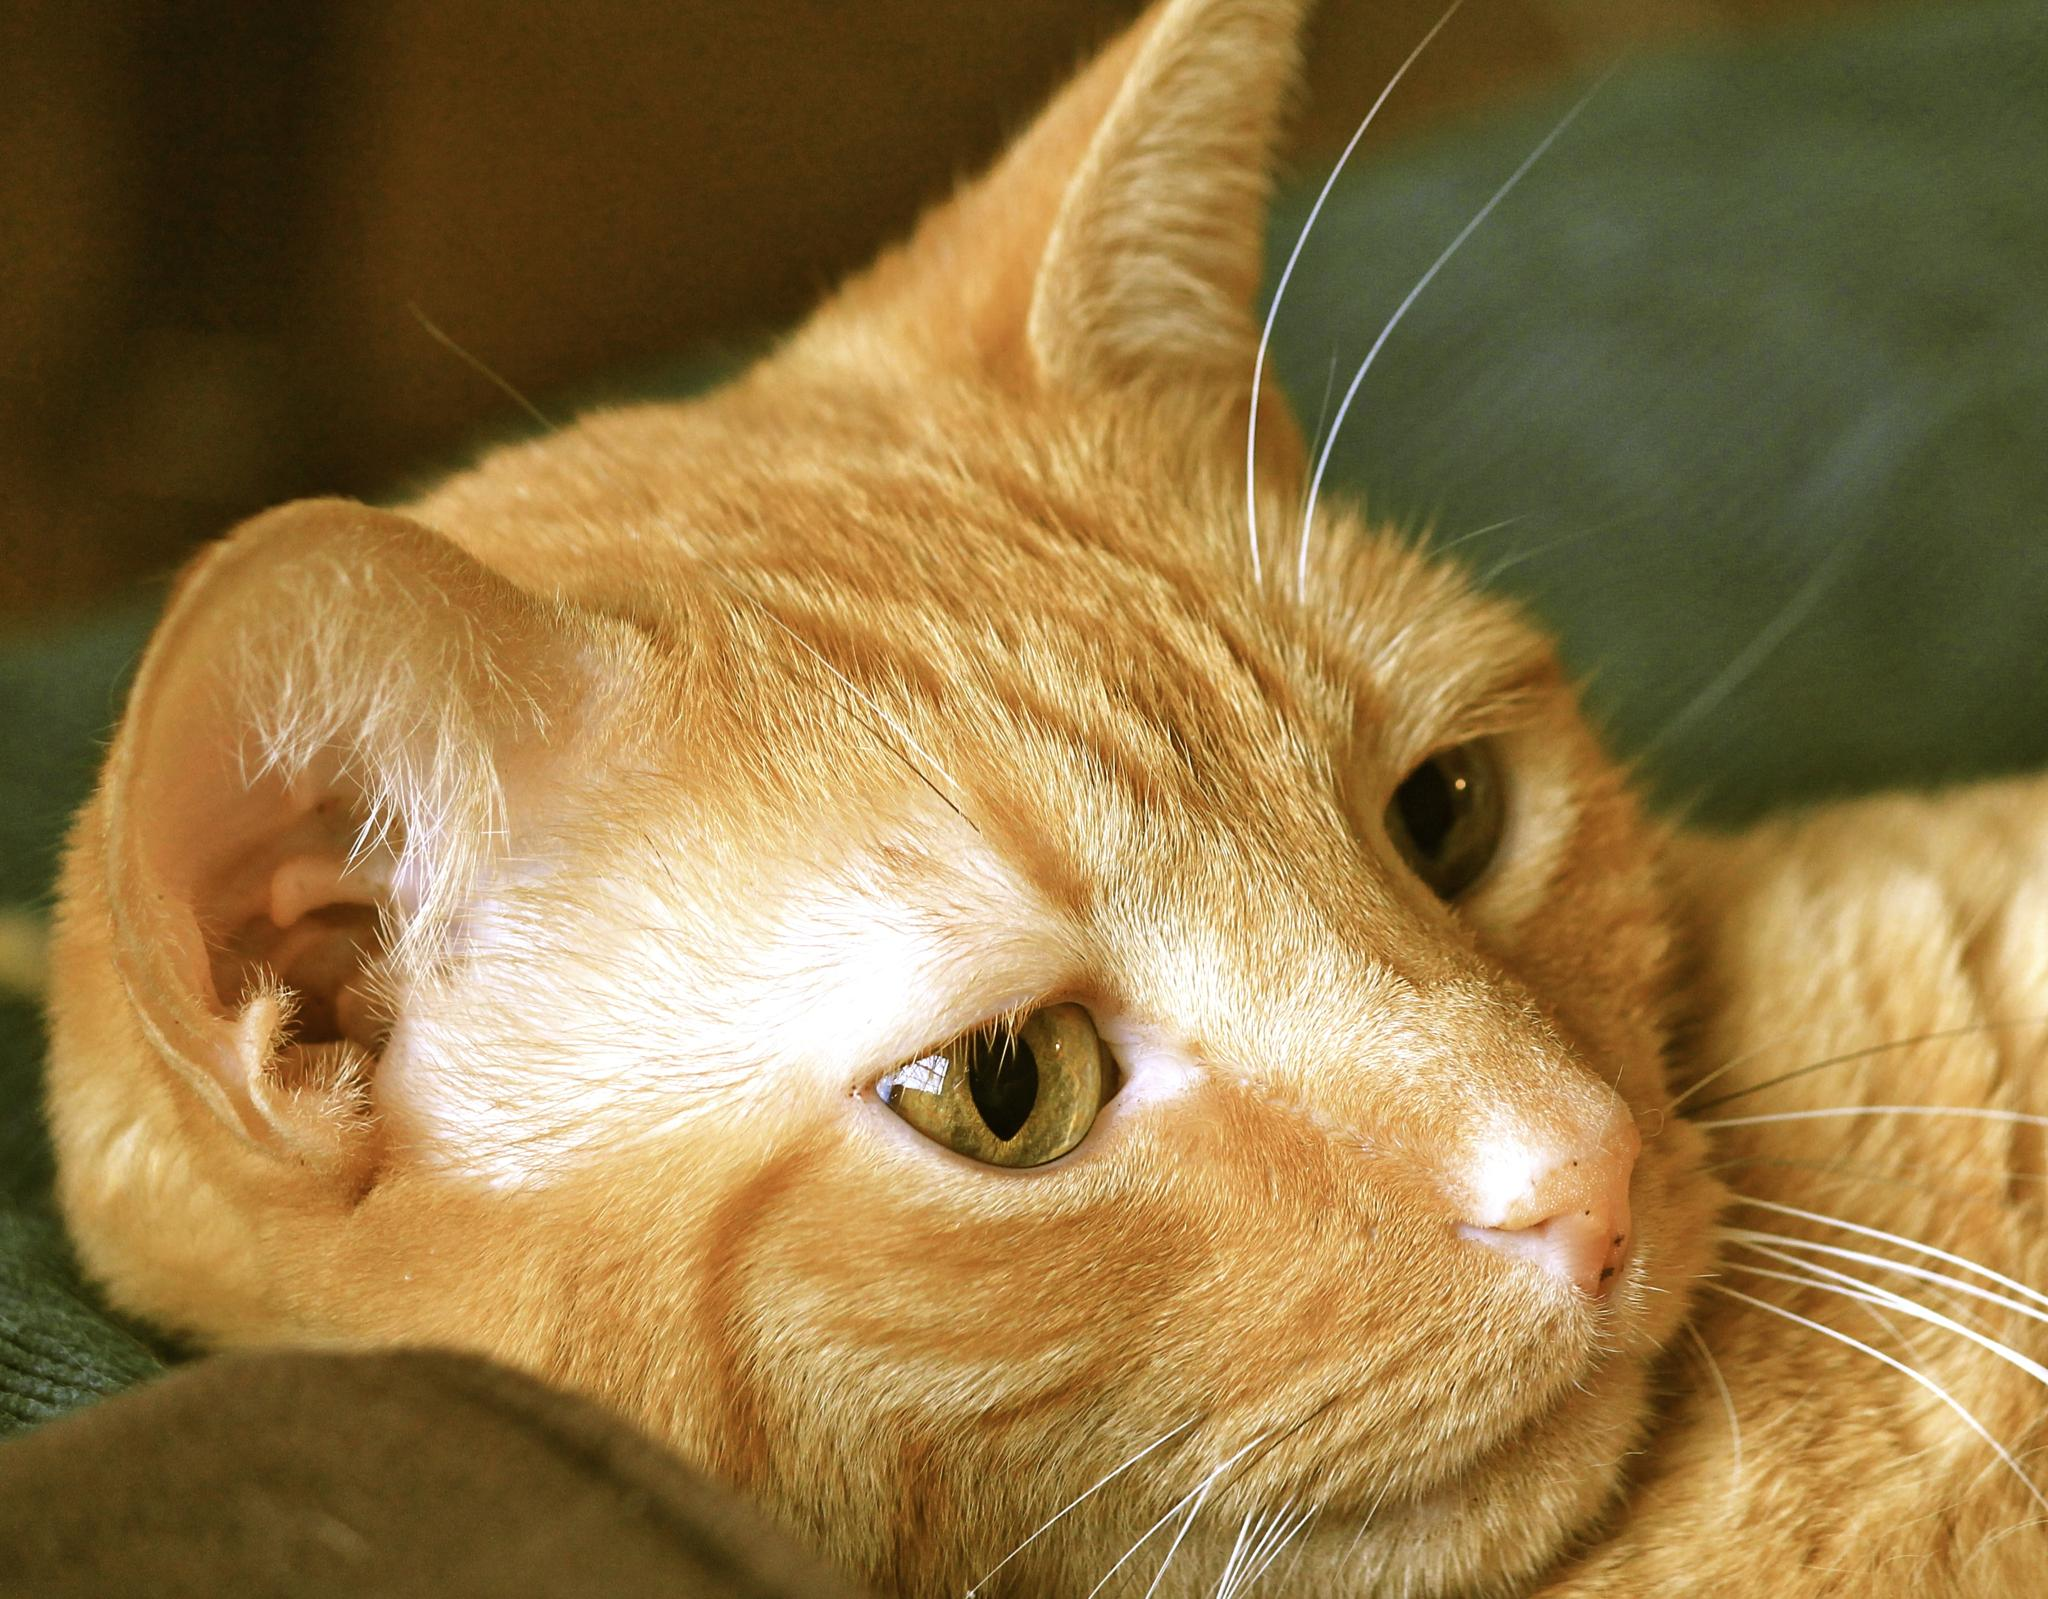 Zippo the yellow cat  by jmedlin61